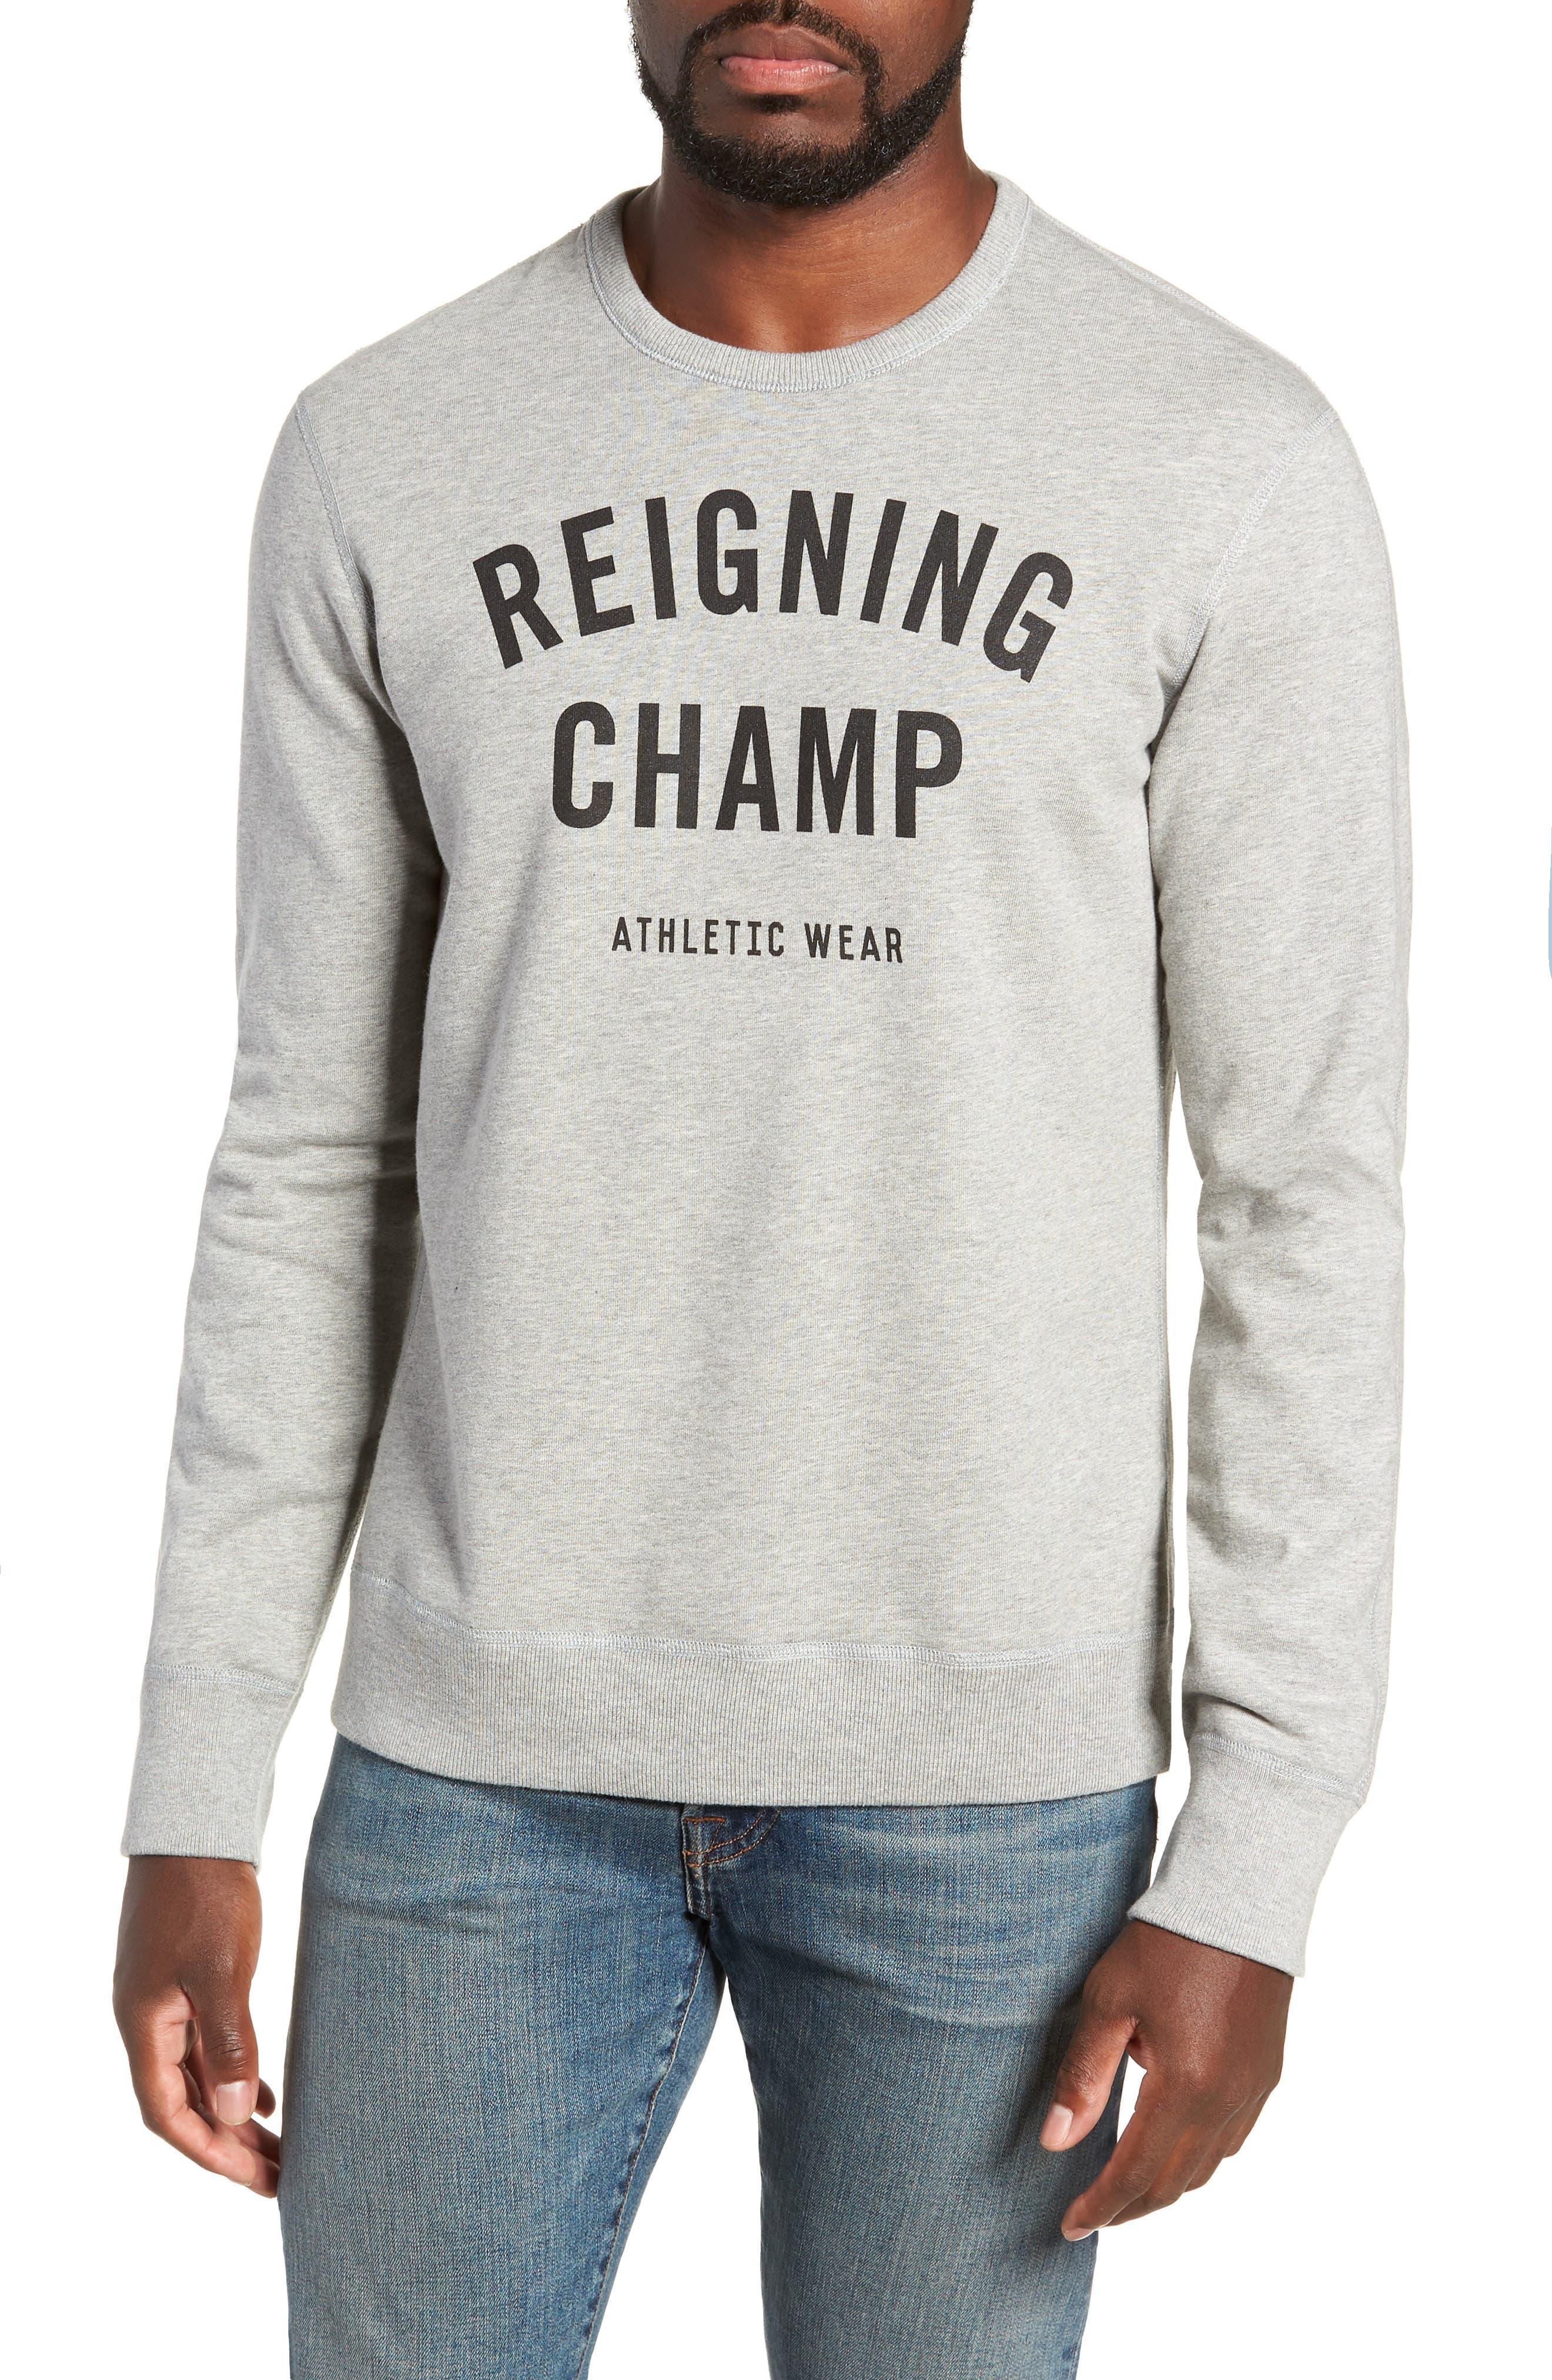 REIGNING CHAMP, Gym Logo Sweatshirt, Main thumbnail 1, color, HEATHER GREY/ BLACK